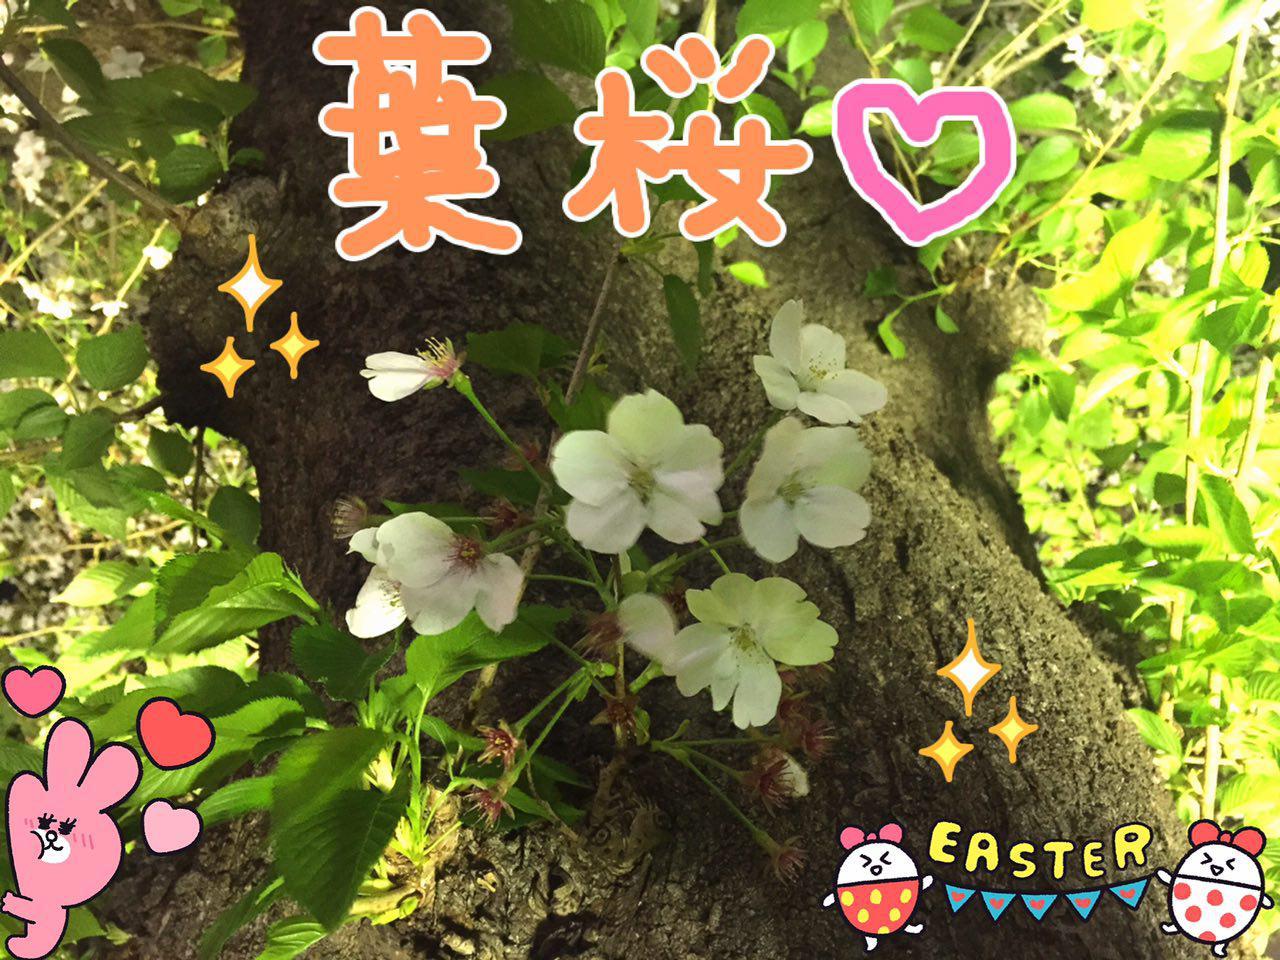 photo_2017-04-14_23-09-50.jpg